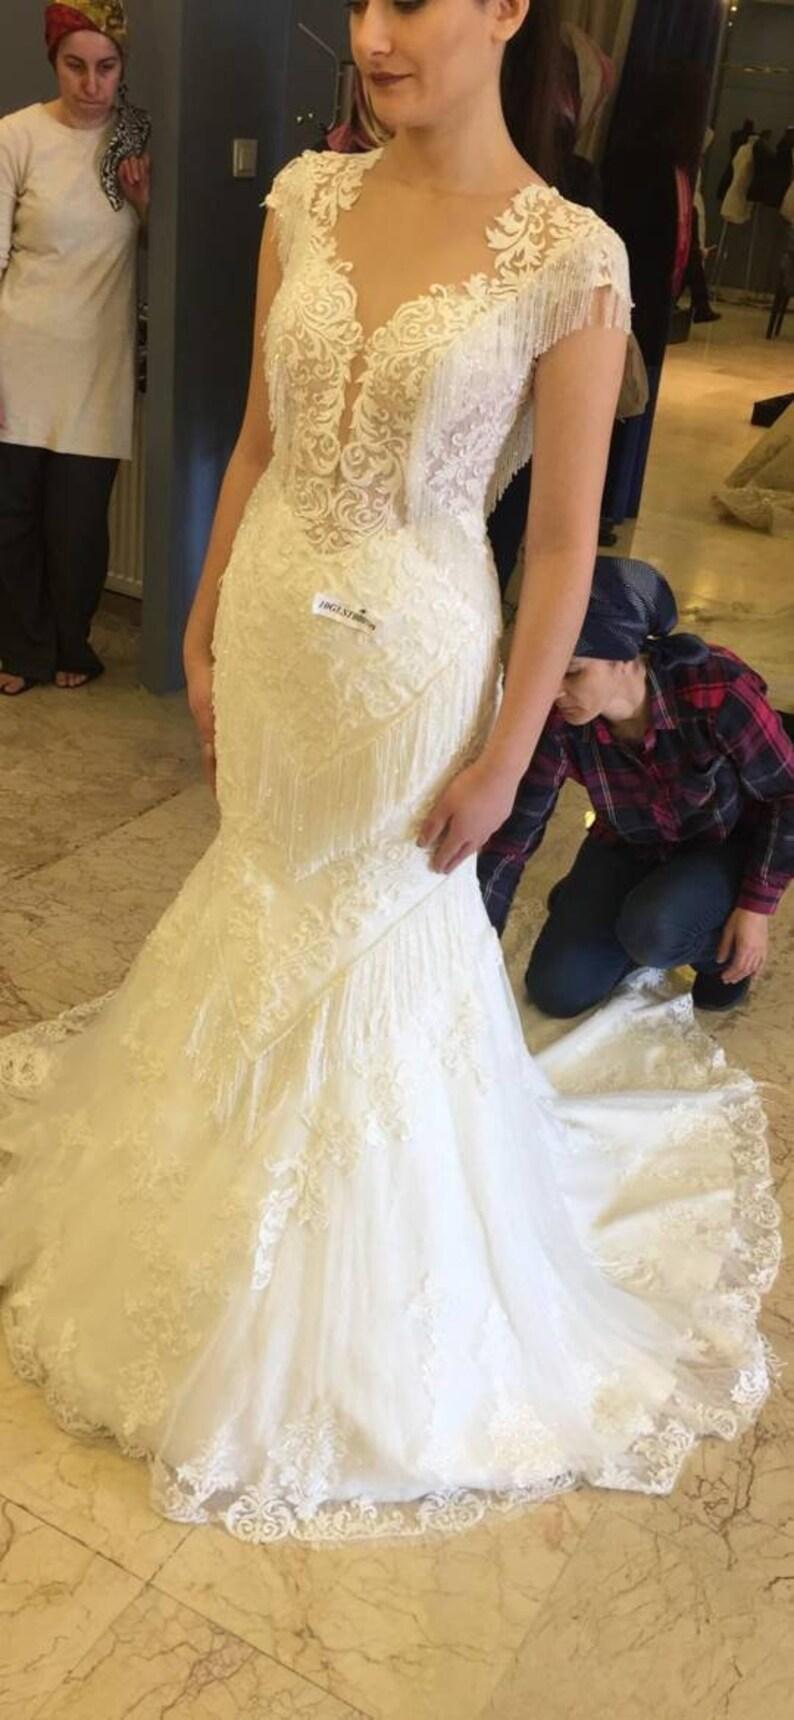 65d5dc5473 Open Back Mermaid Wedding Dress. Beaded Trumpet Wedding Gown. Full of Work.  Beautiful. Berta Bridal Liz Martinez Galia Lahav Pronovias